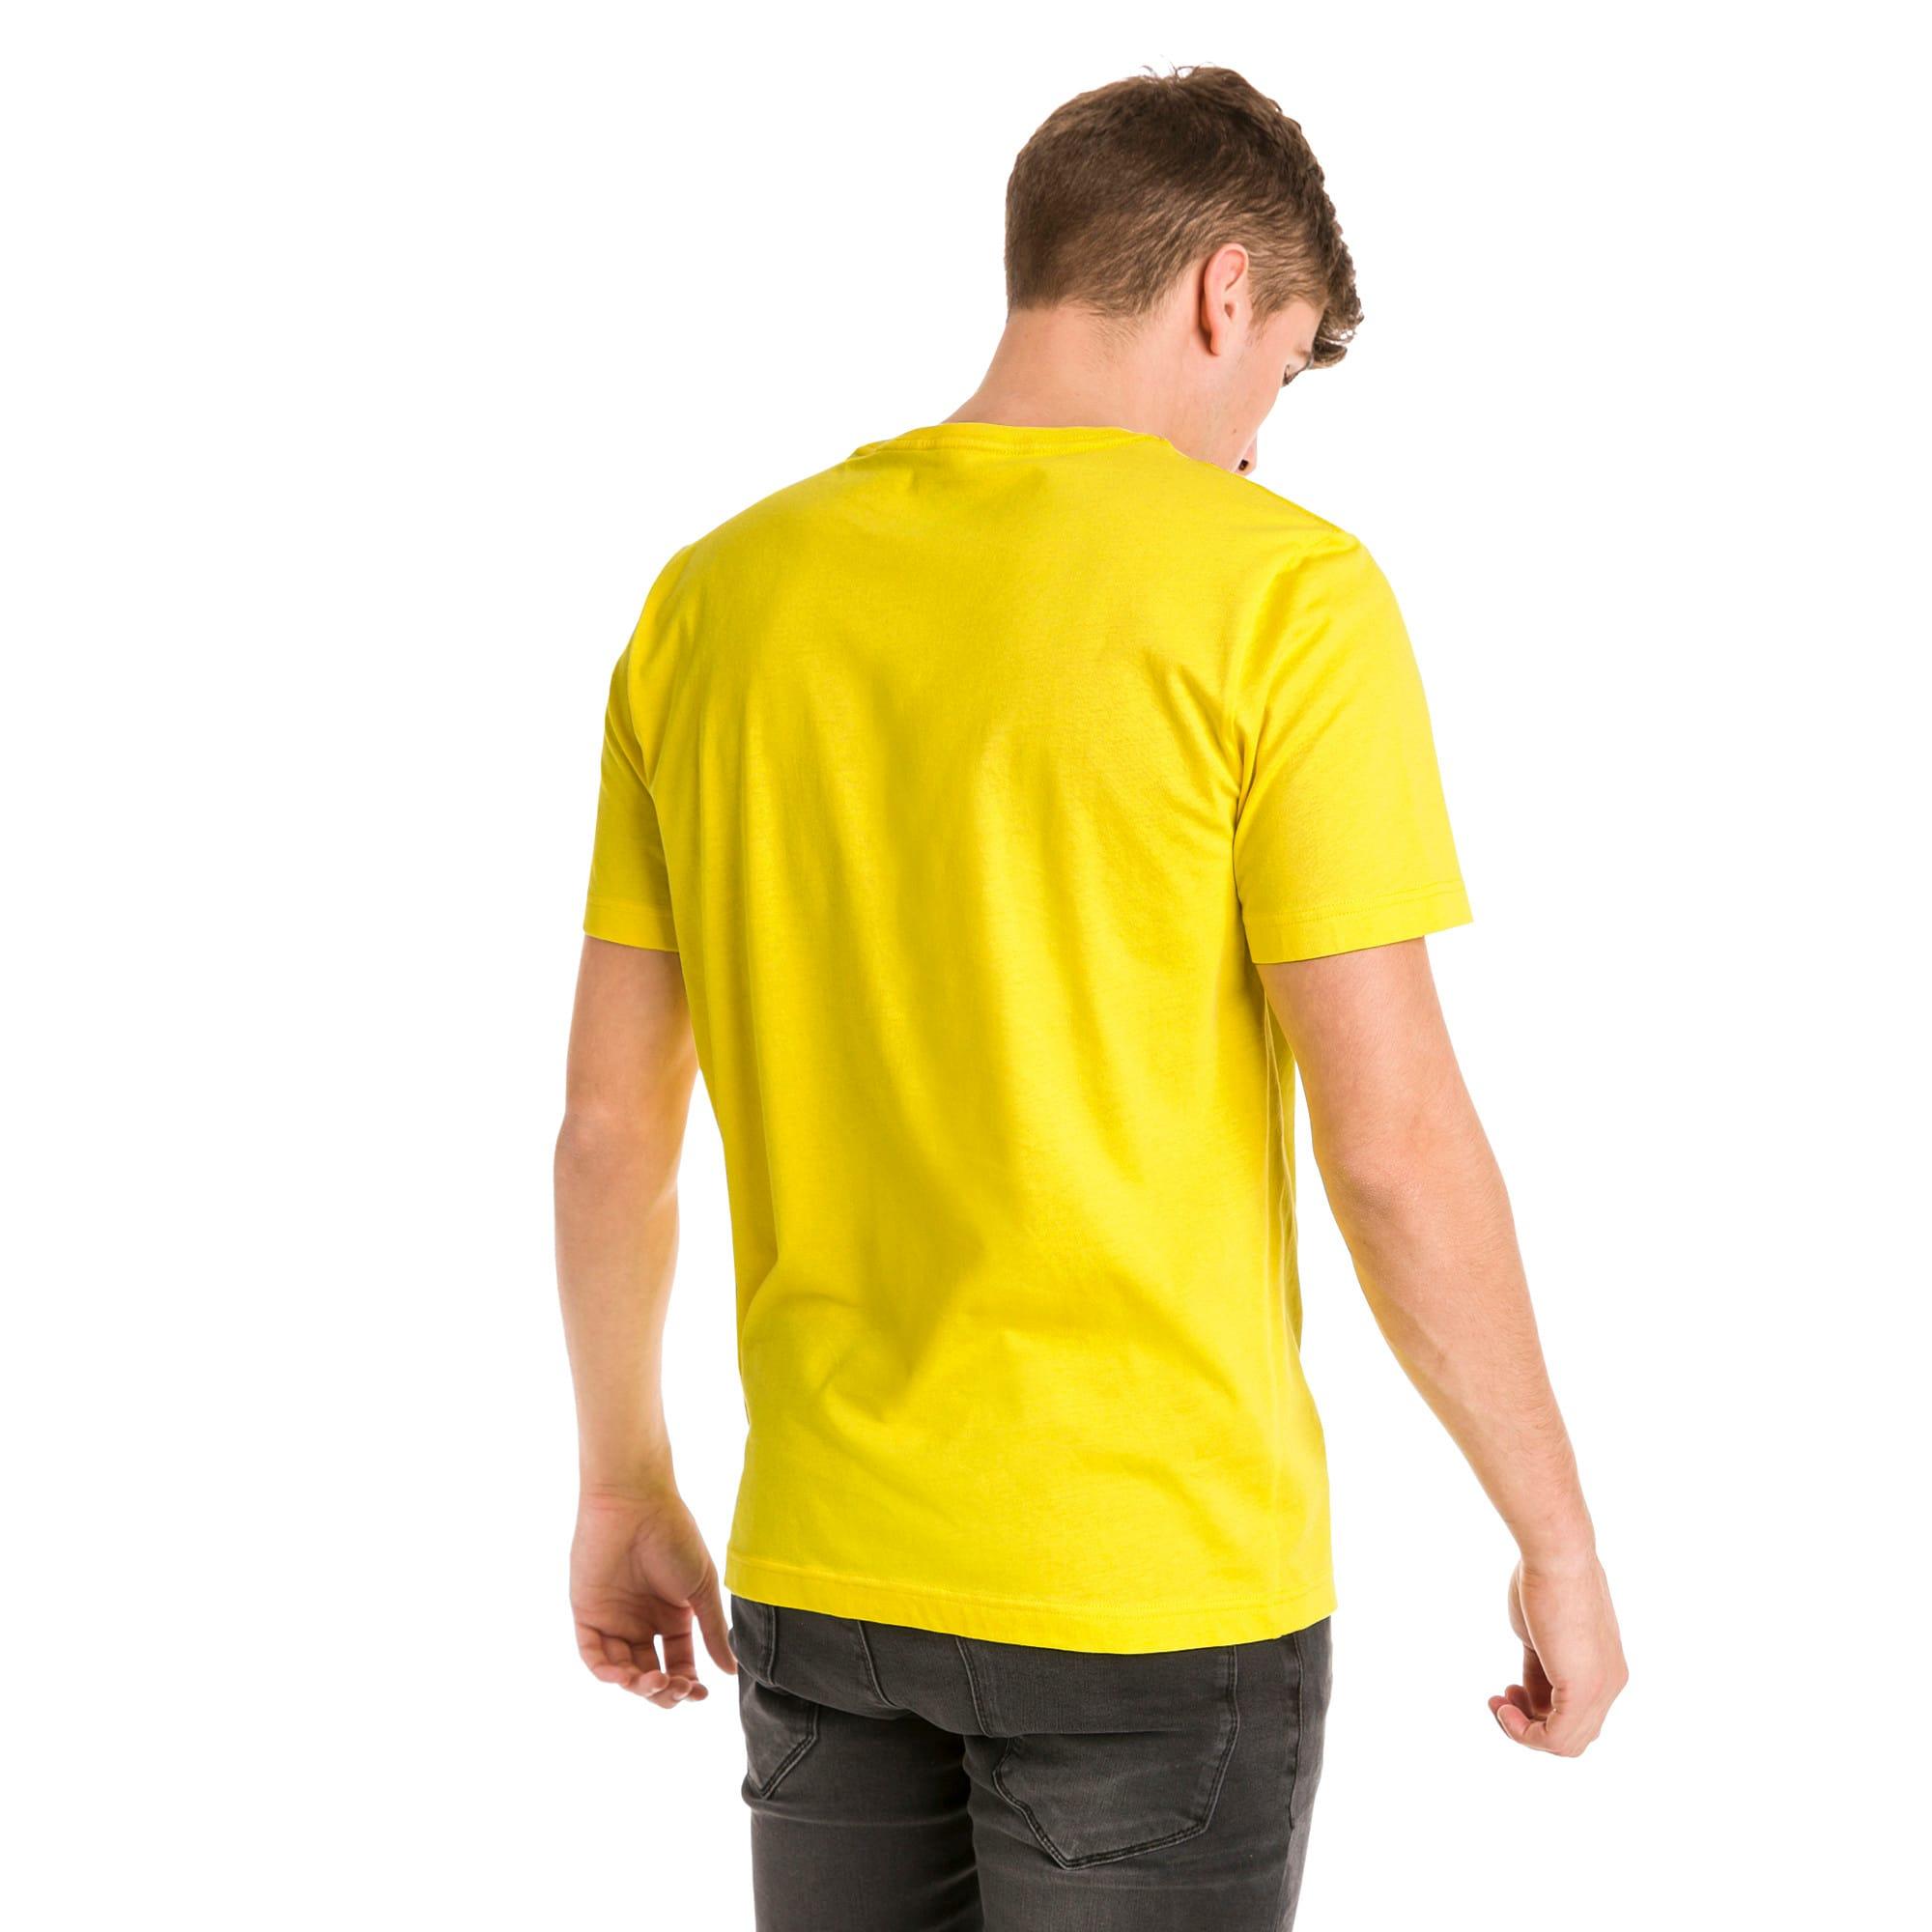 Thumbnail 2 of T-shirt Essentials uomo, Blazing Yellow, medium